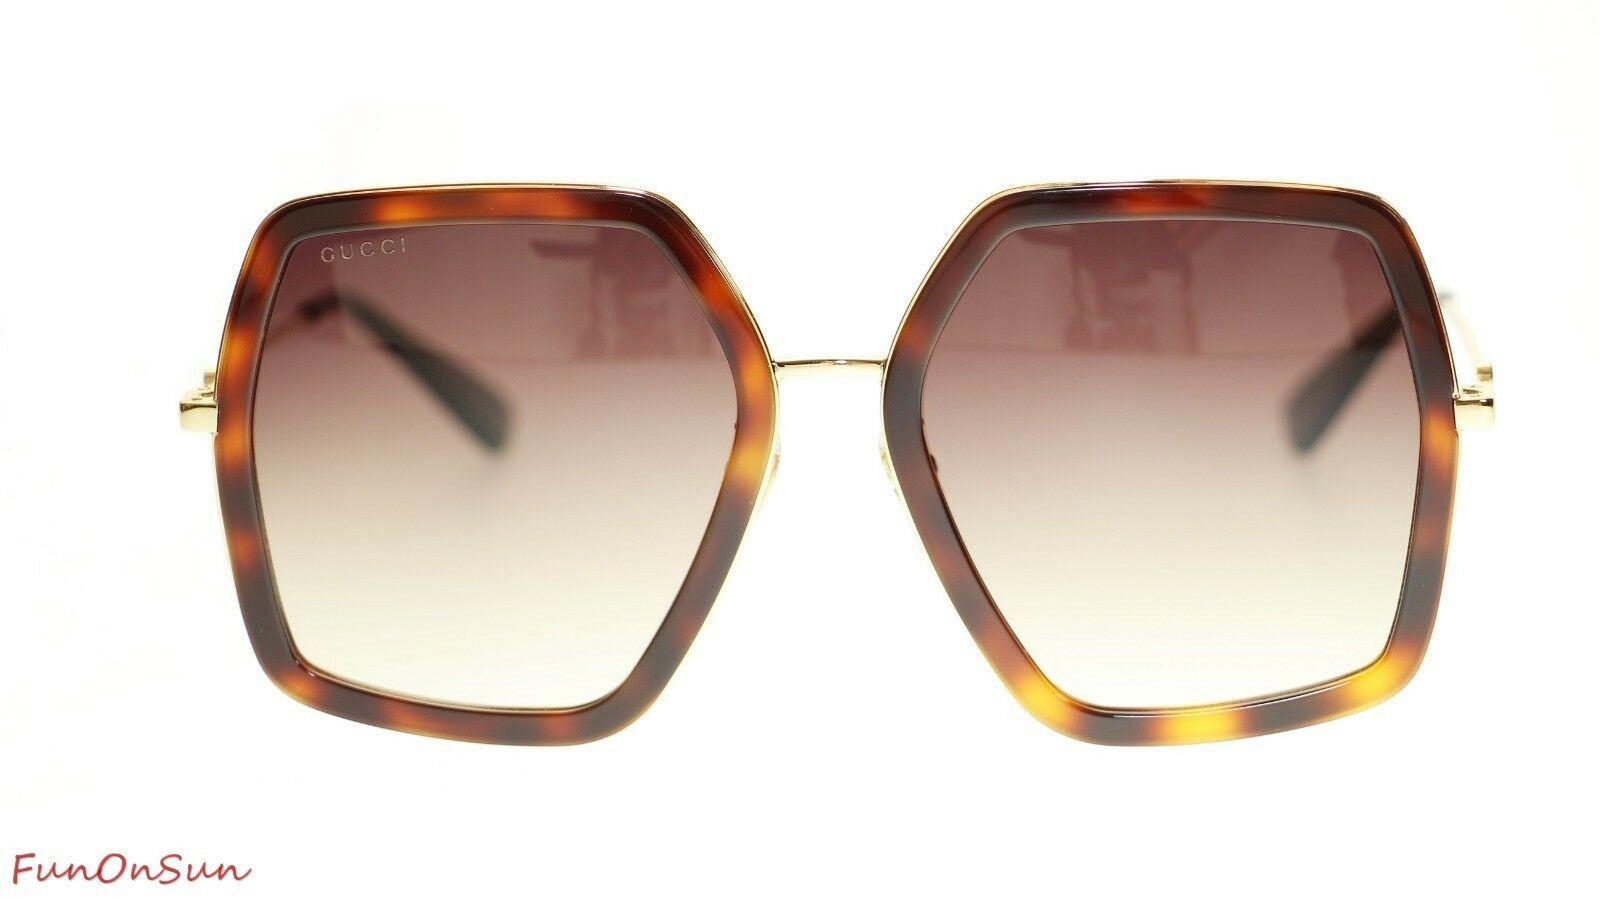 41f7d403c Gucci Women Design Sunglasses GG0106S 002 Havana Gold/Brown Gradient Lens  56mm - $202.73